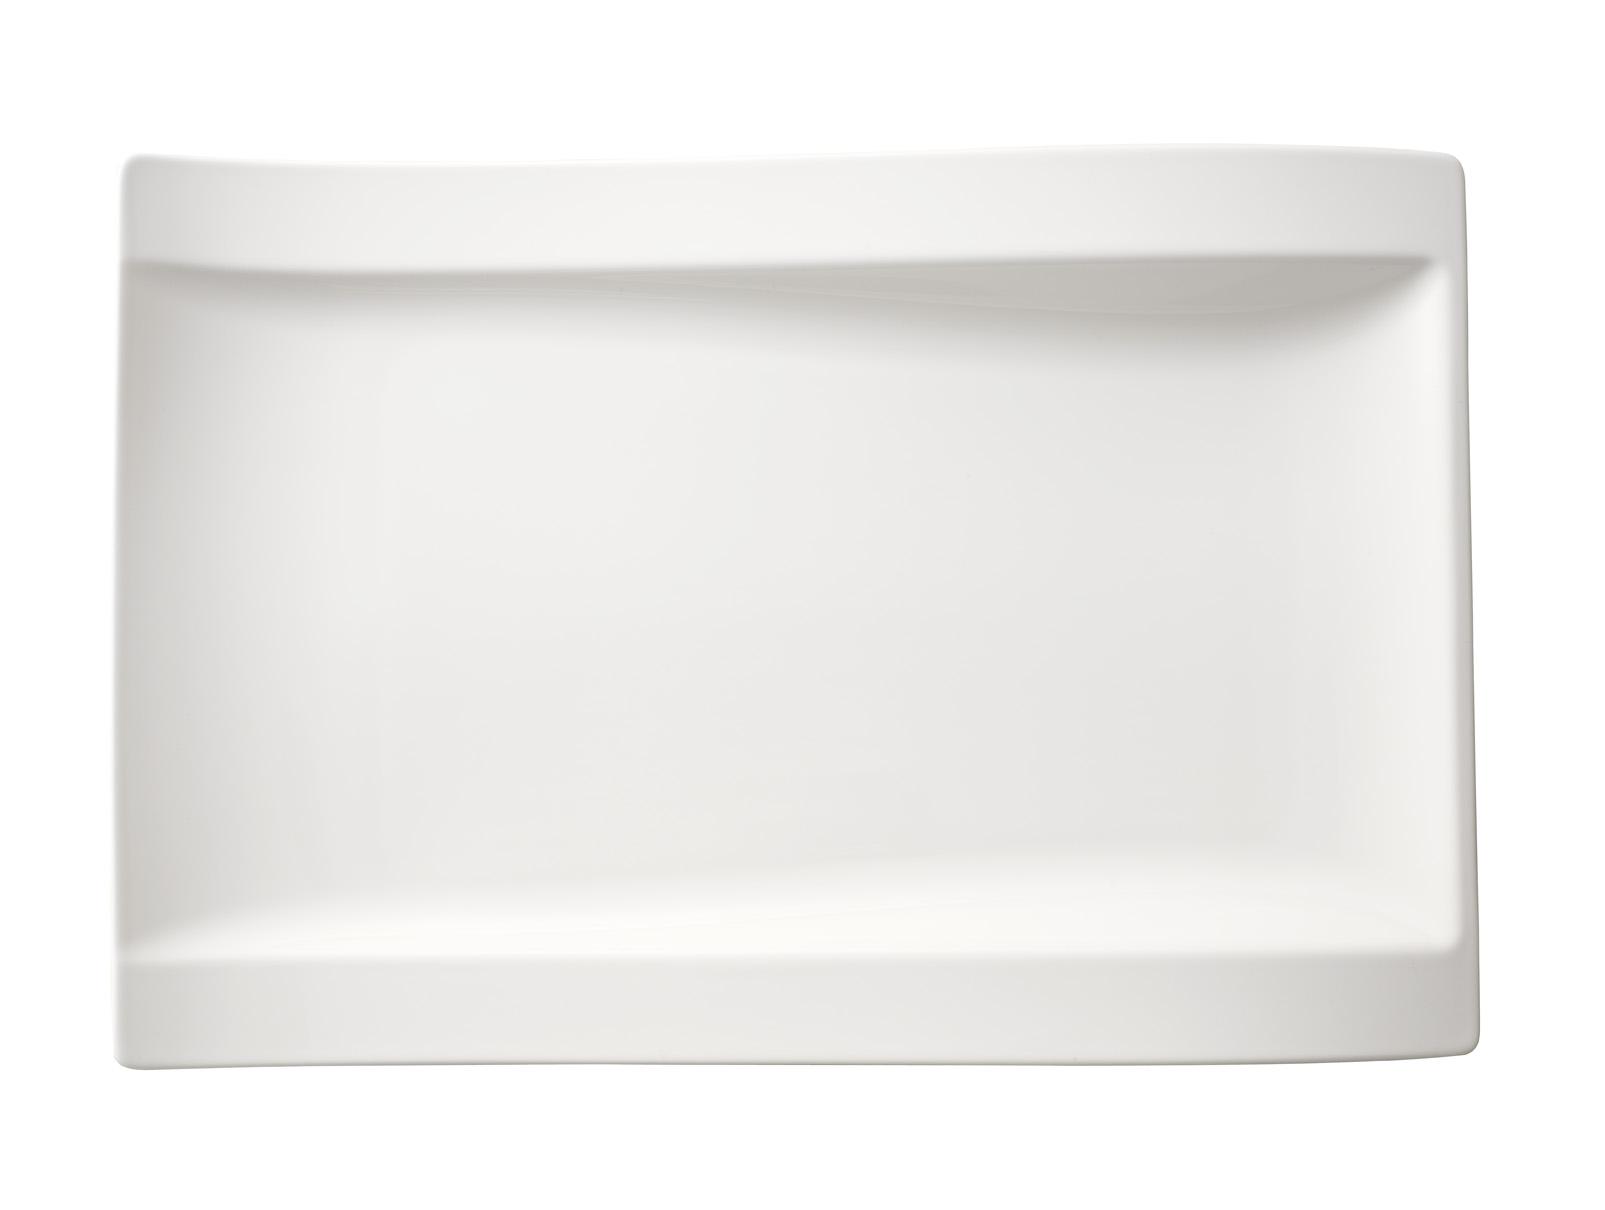 gourmetteller 37x25cm neu new wave villeroy boch new. Black Bedroom Furniture Sets. Home Design Ideas